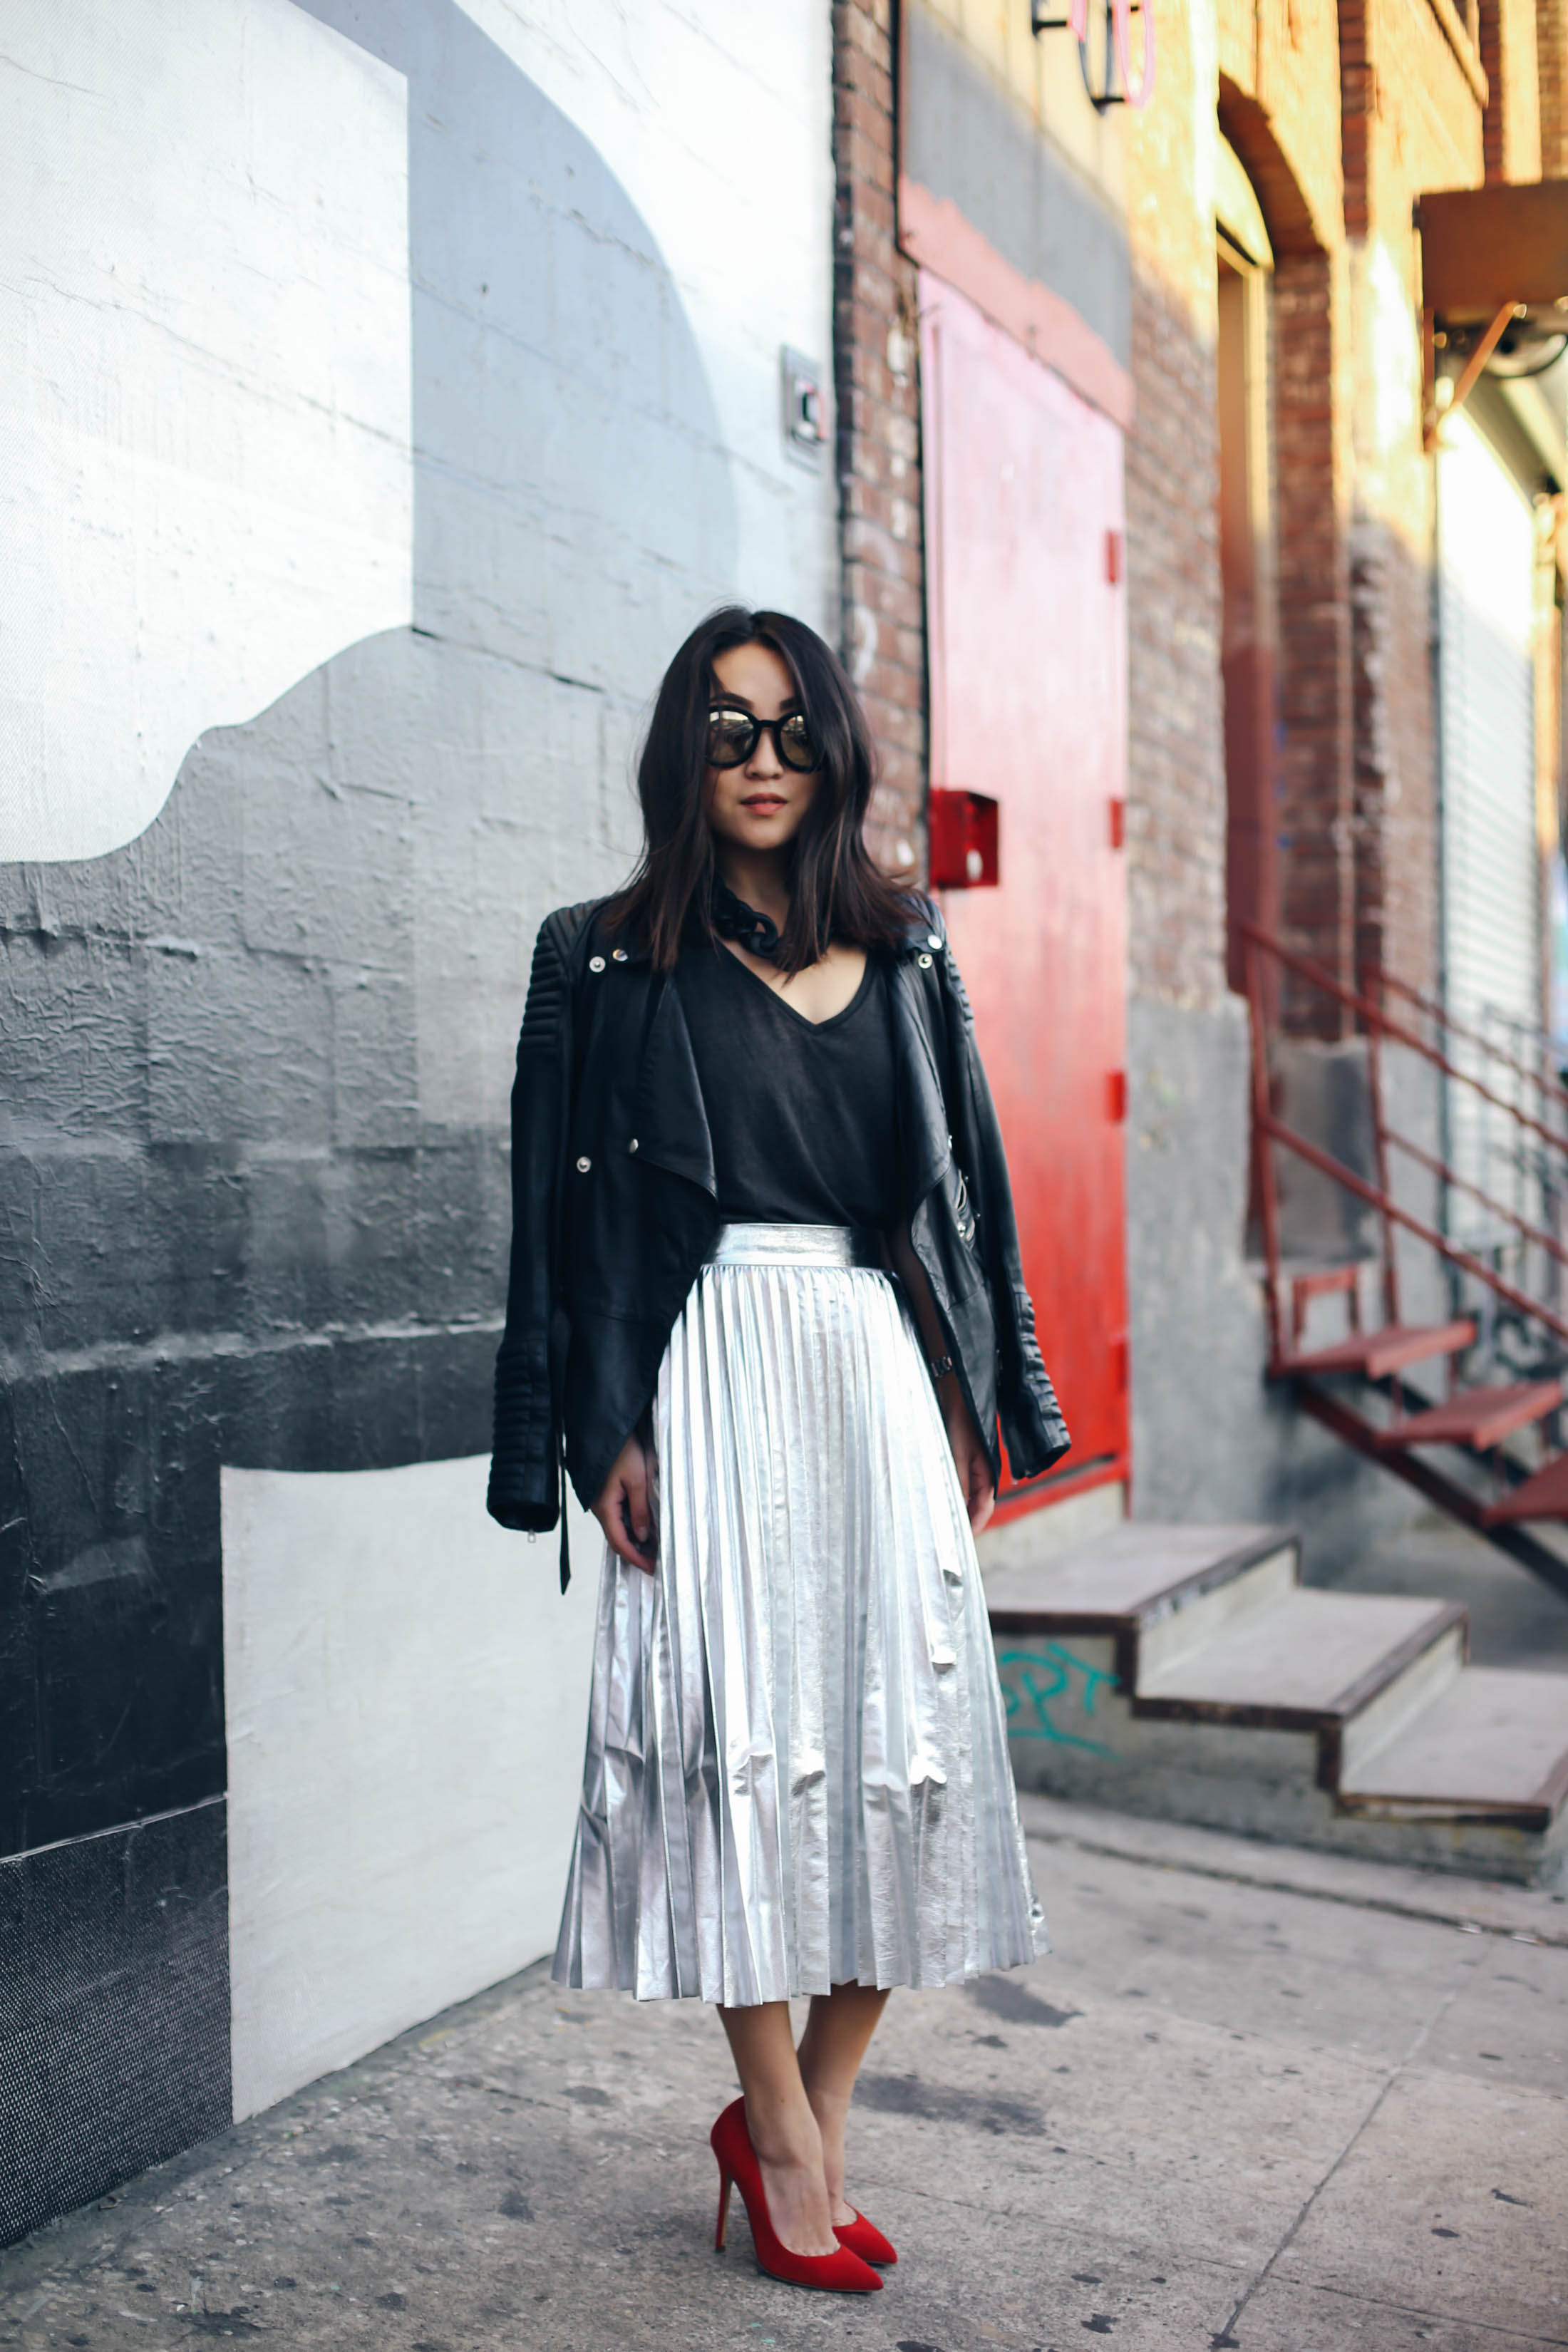 2-silver-skirt-nina-citizensrunway-ryanbyryanchua-9257.jpg